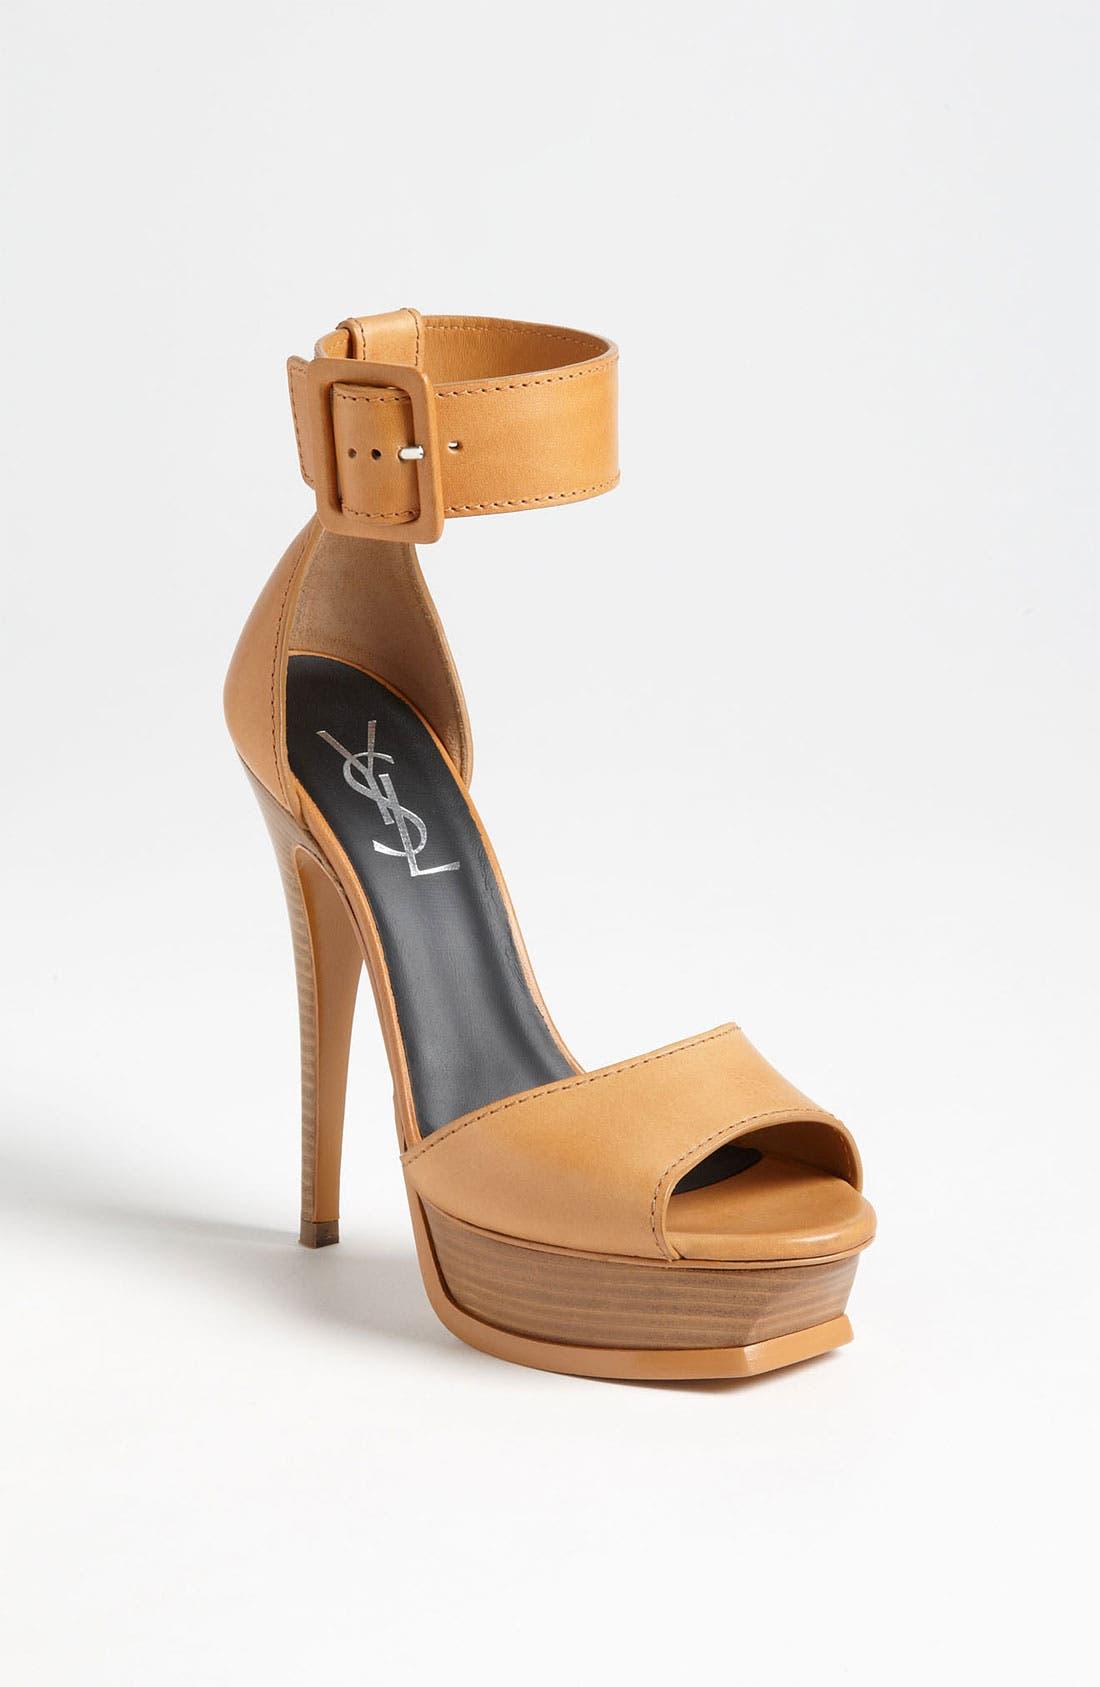 Alternate Image 1 Selected - Saint Laurent 'Tribute' Sandal